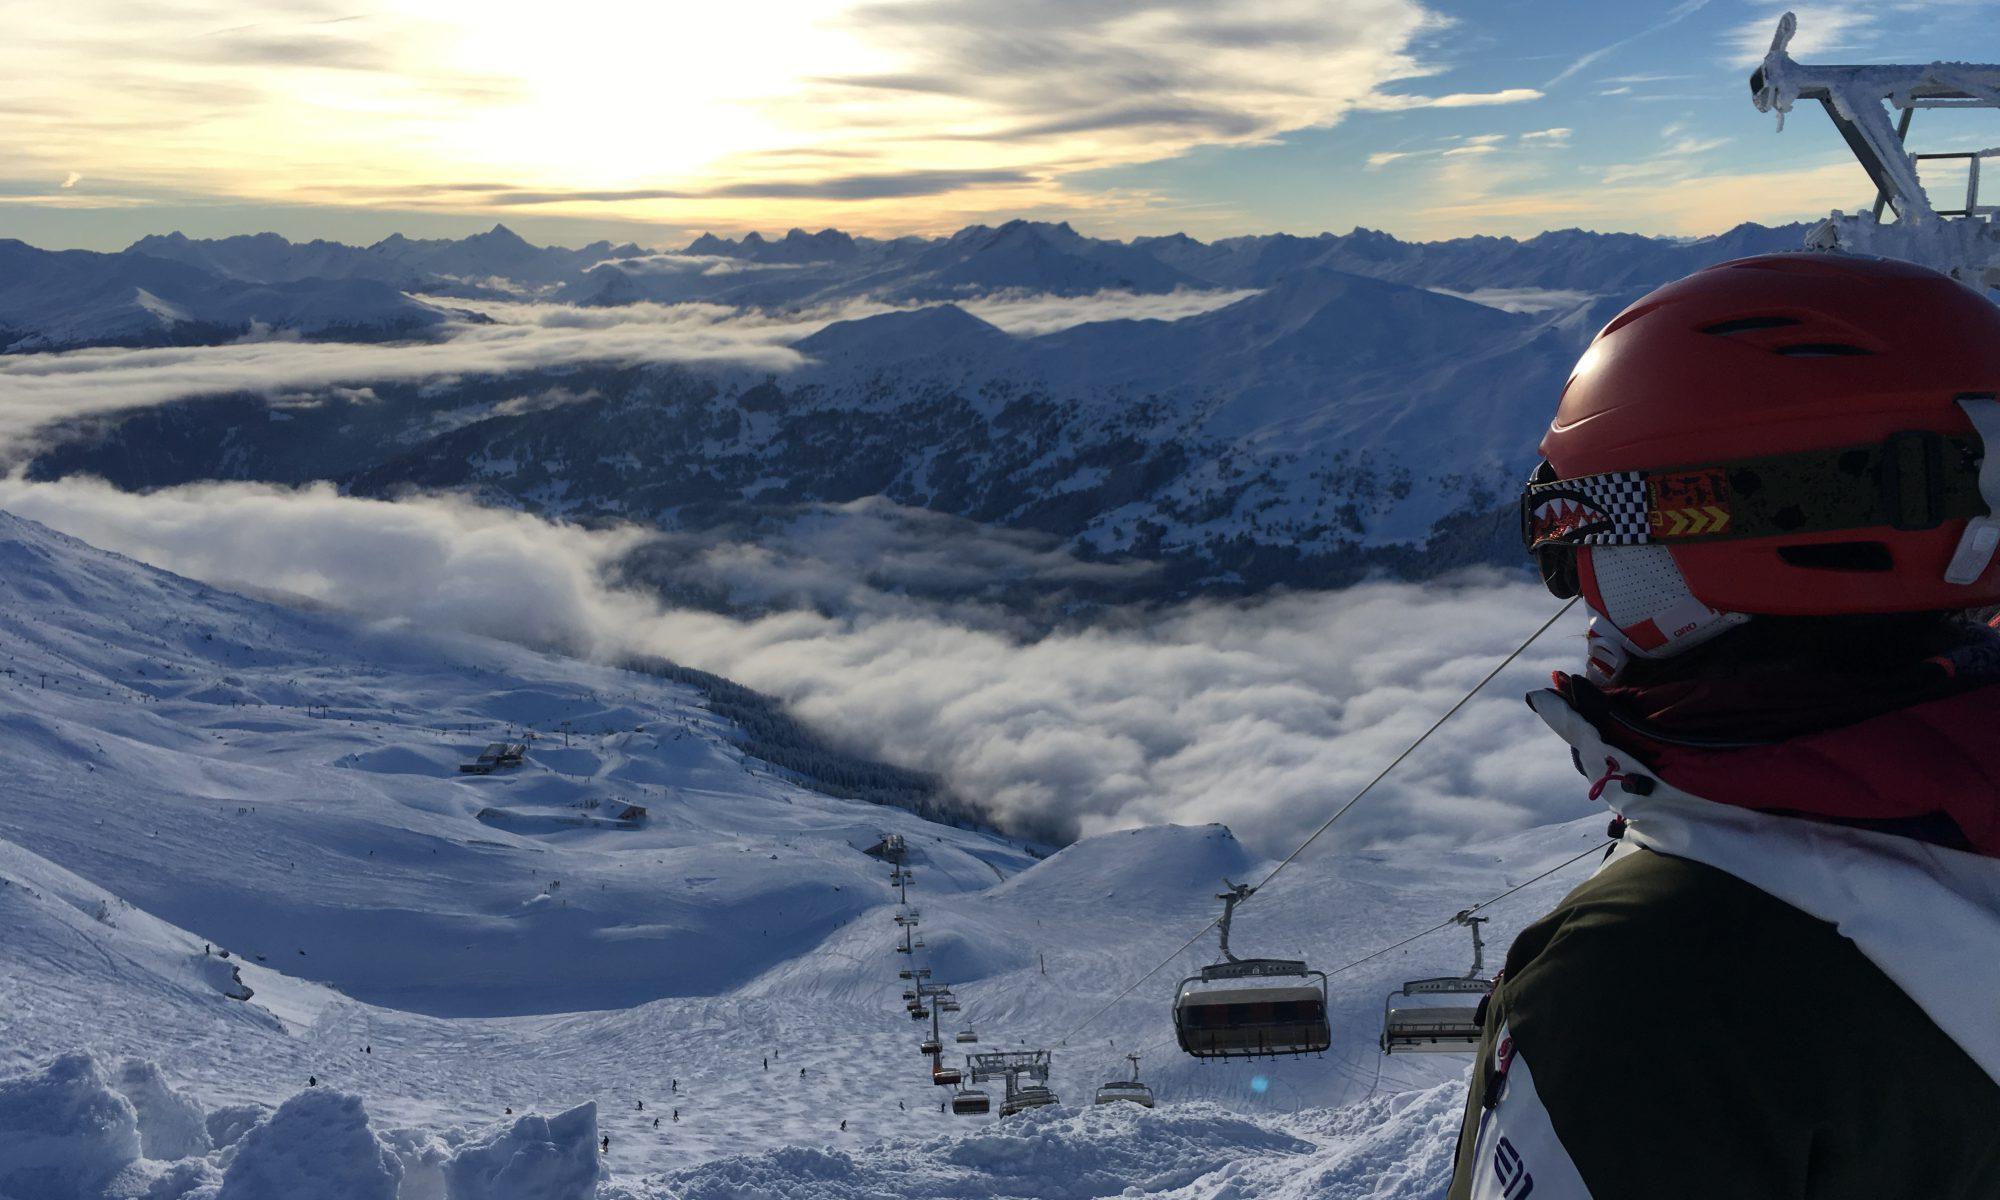 Skiclub Parpan